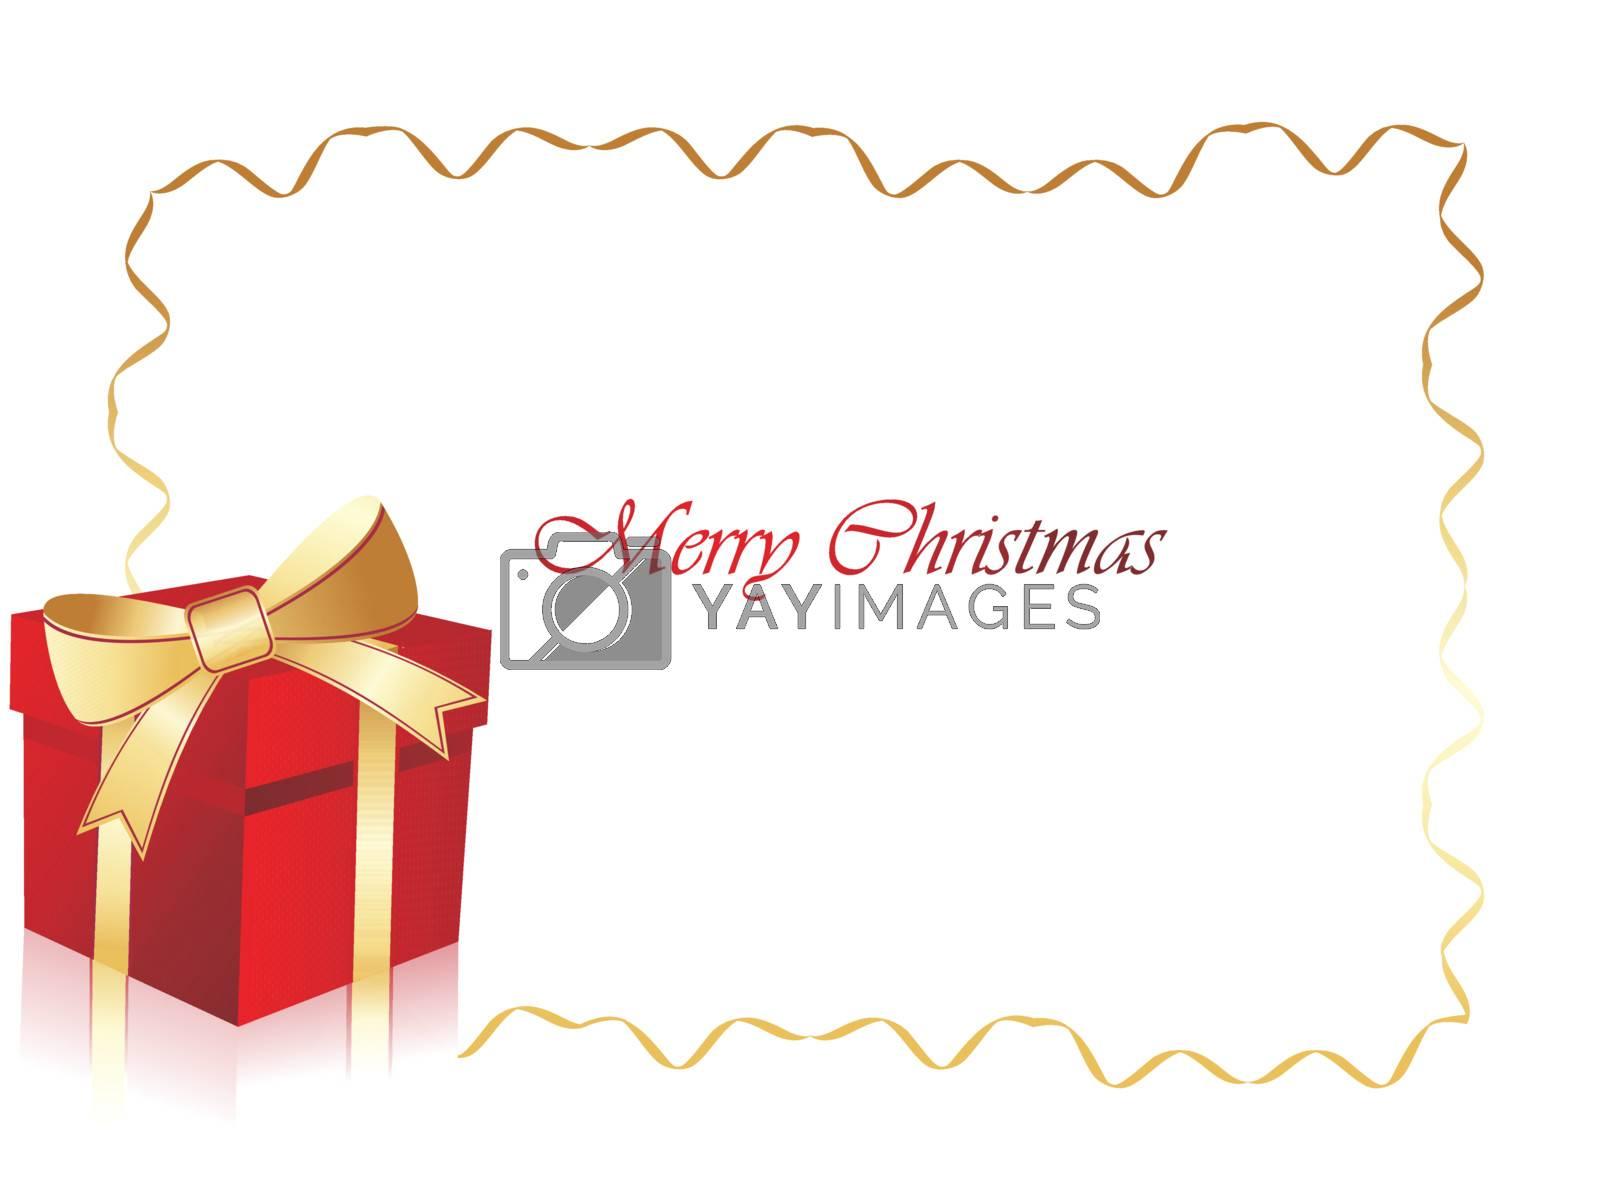 christmas birthday gift box frame, illustration by aispl